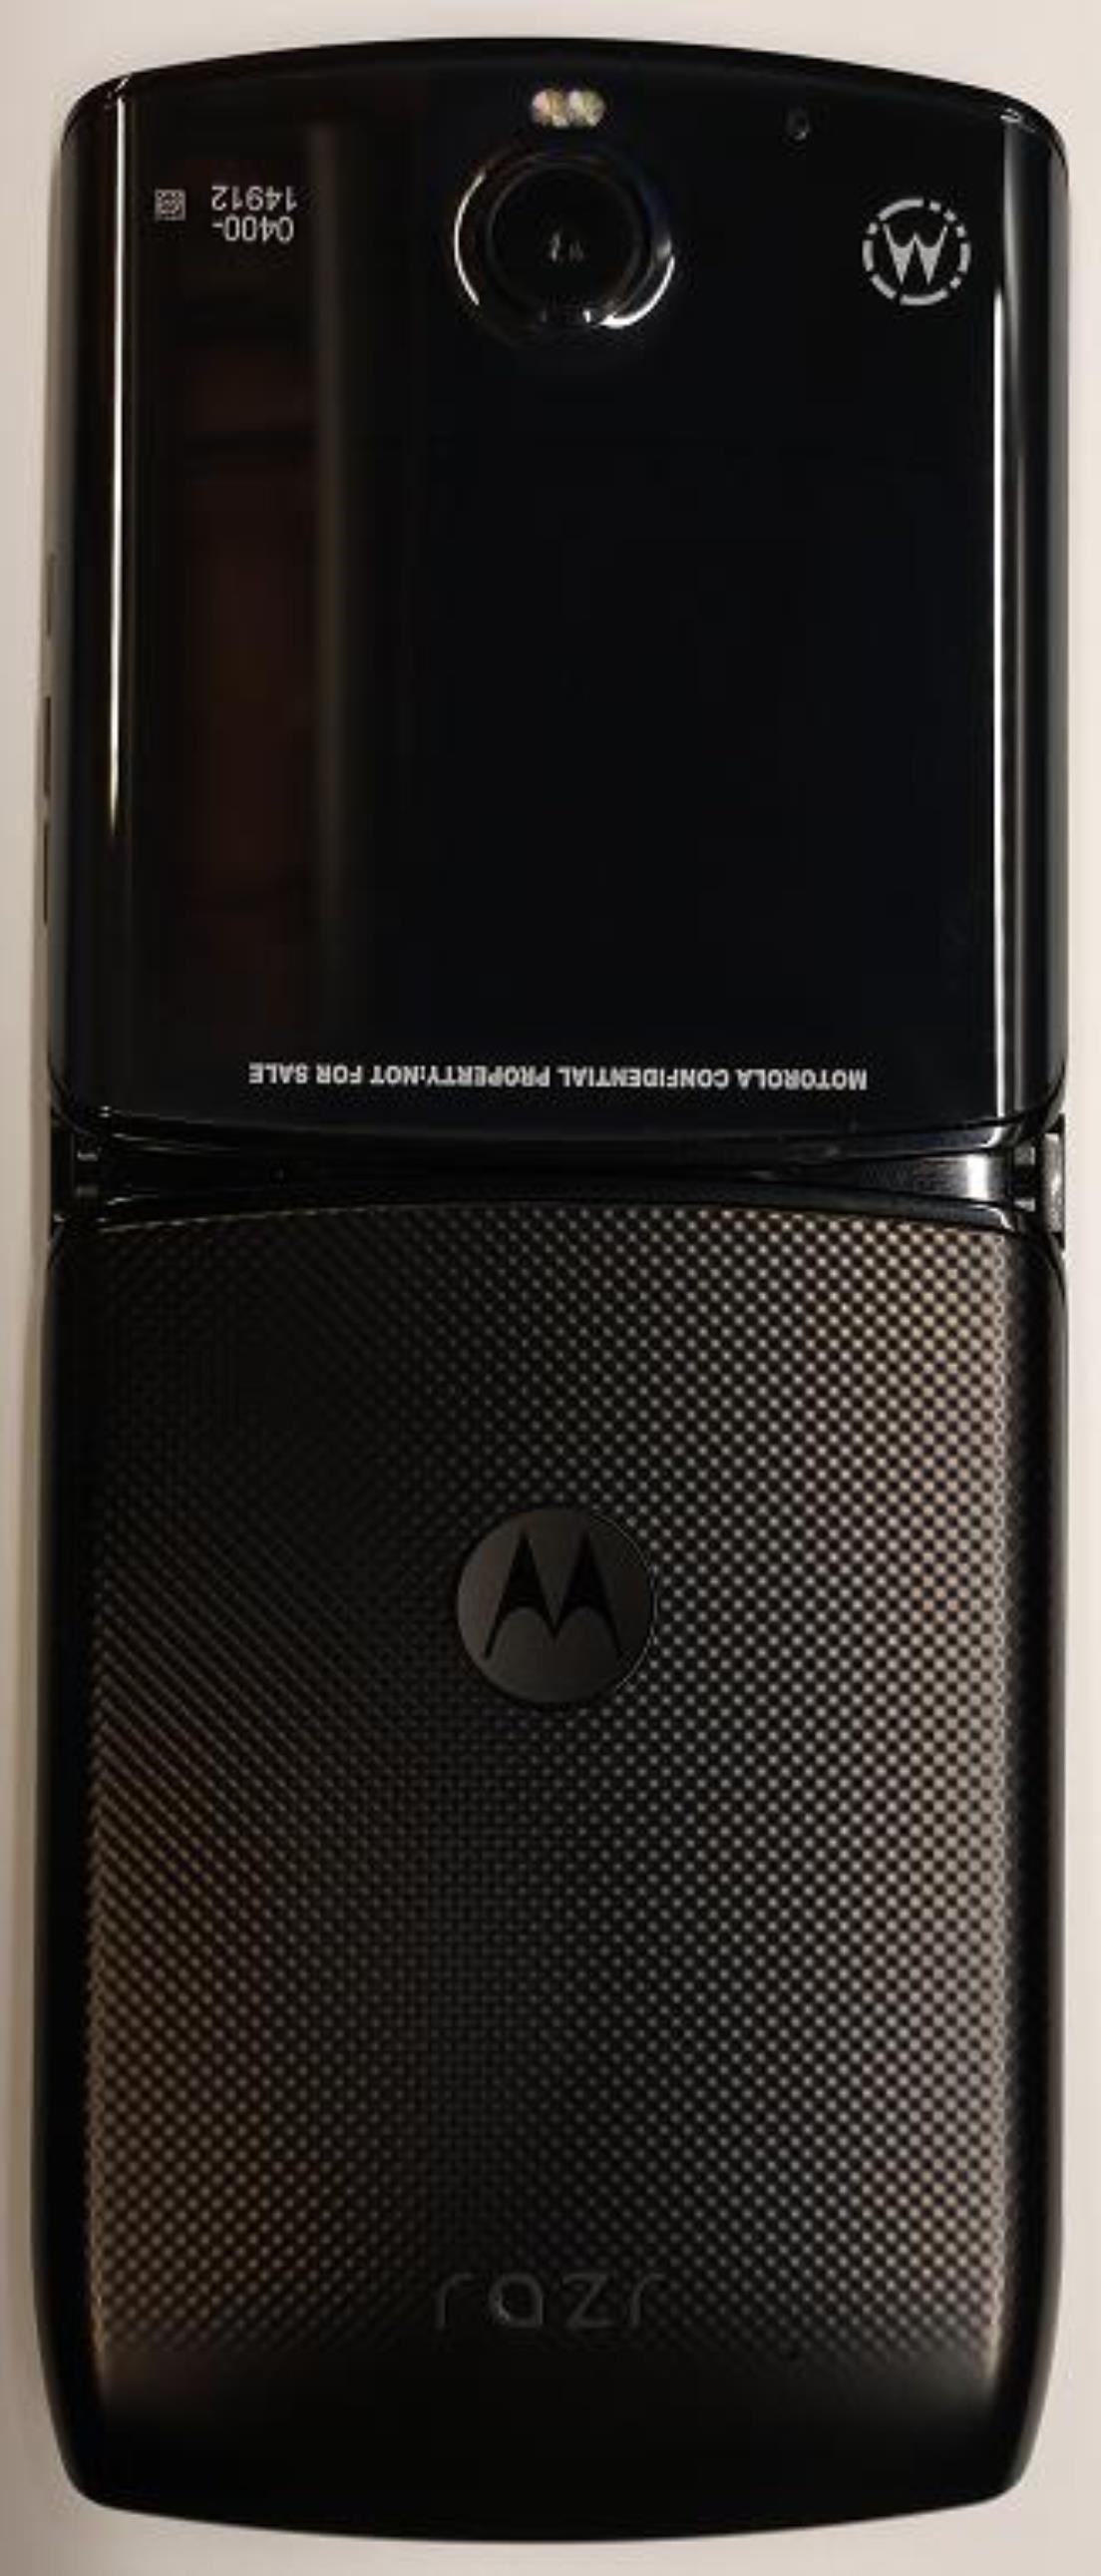 New Photos of the 2019 Motorola RAZR Surface in FCC Filing, Reveal Dimensions, Notch & Biometrics